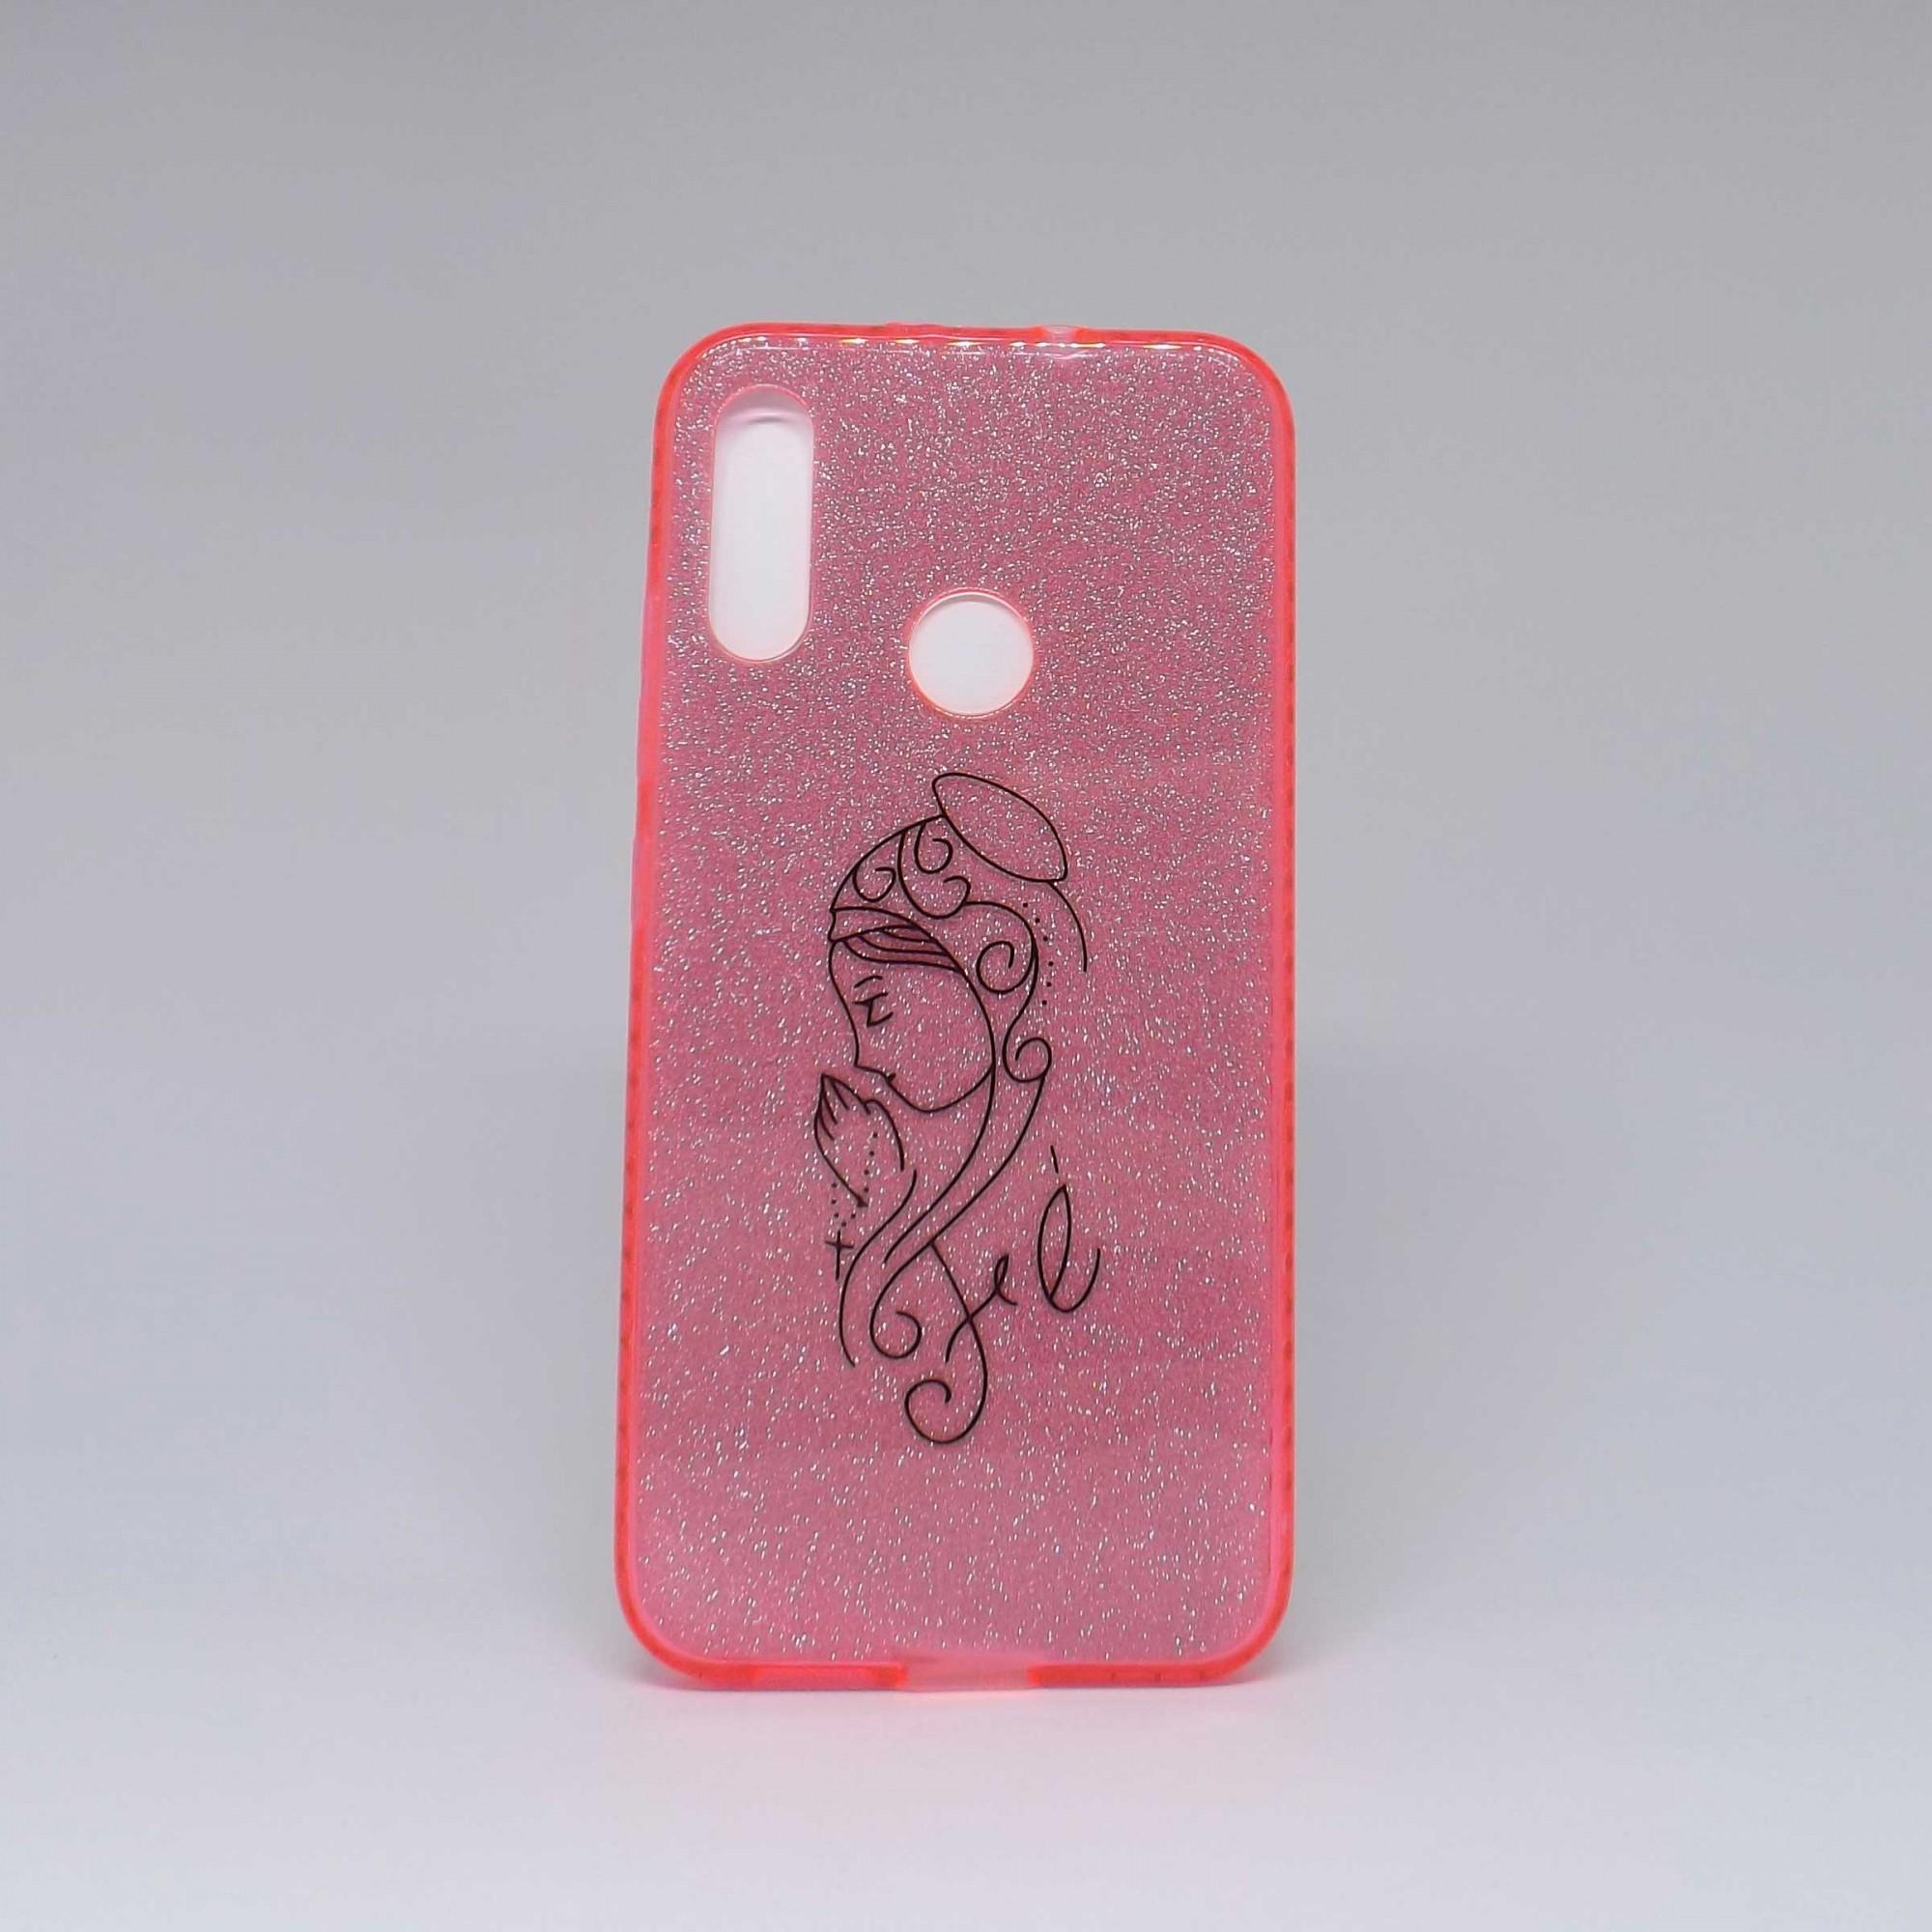 Capa Motorola E6 Plus Brilho Estampado - Nossa Senhora